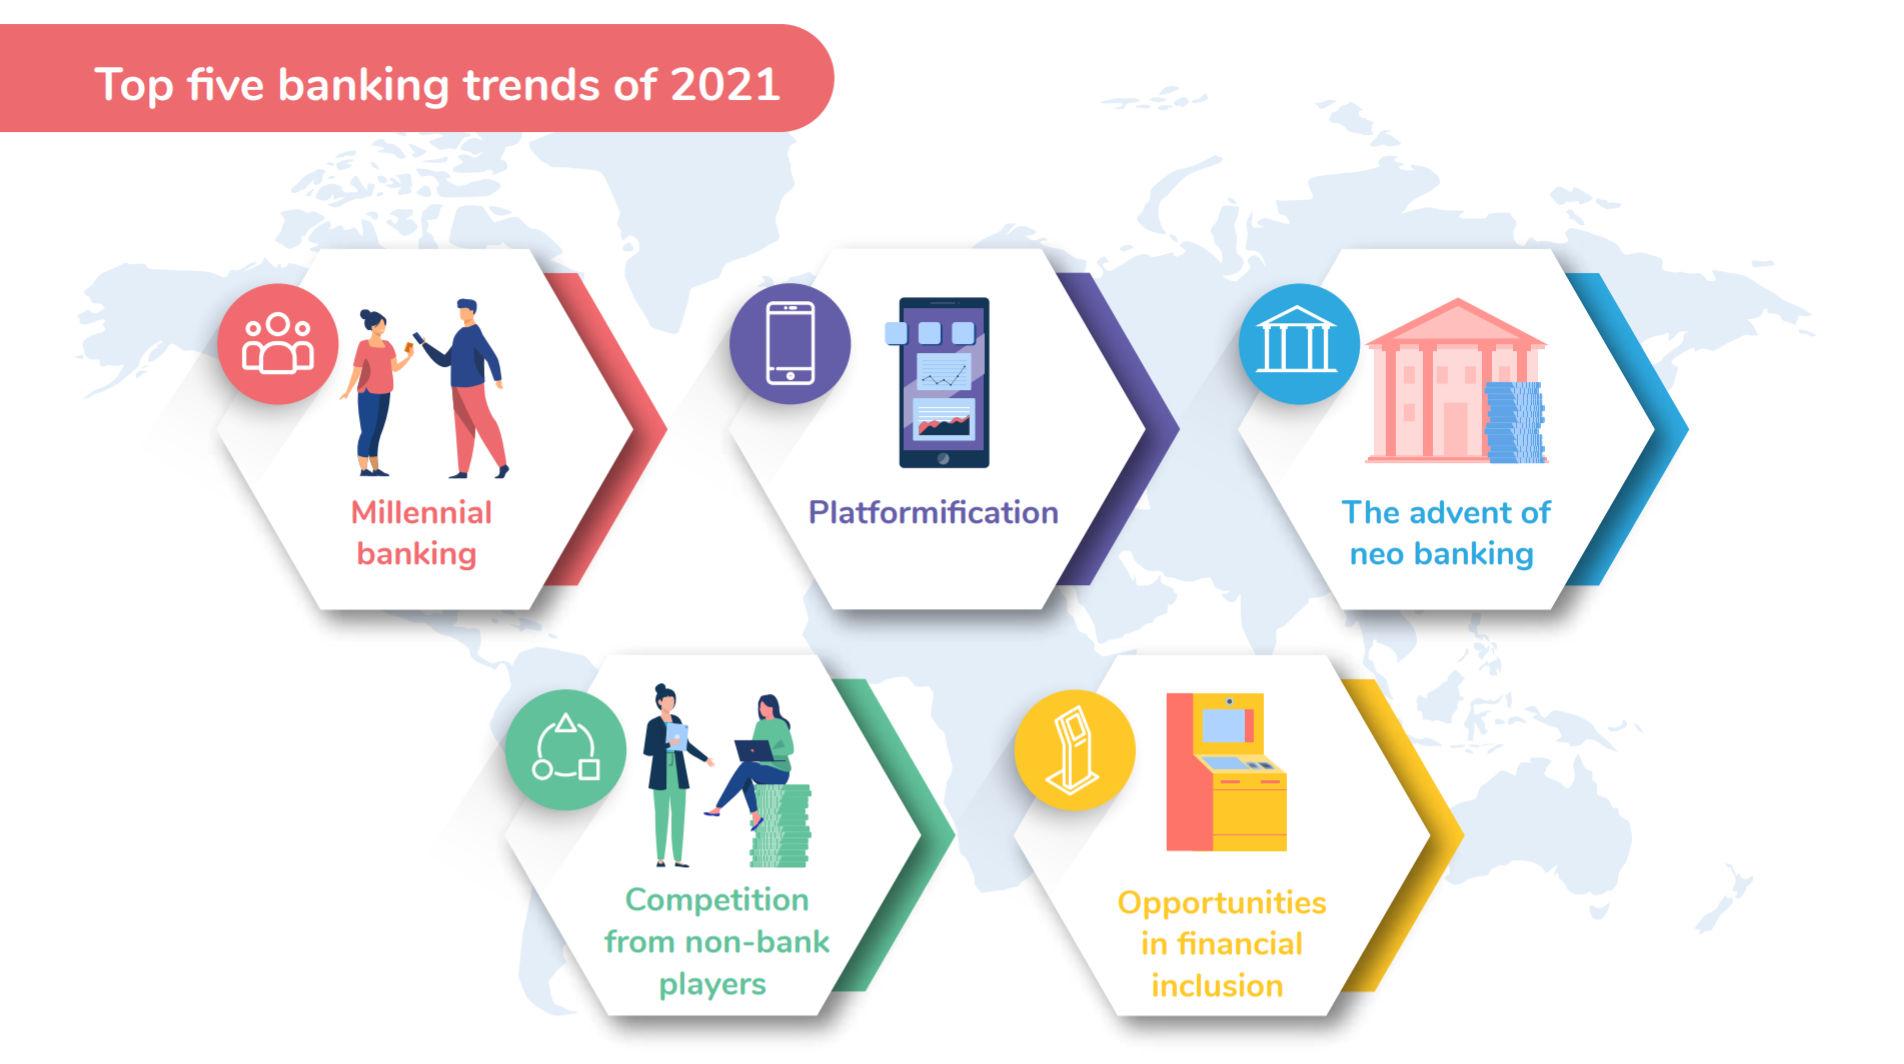 Top 5 Banking trends 2021